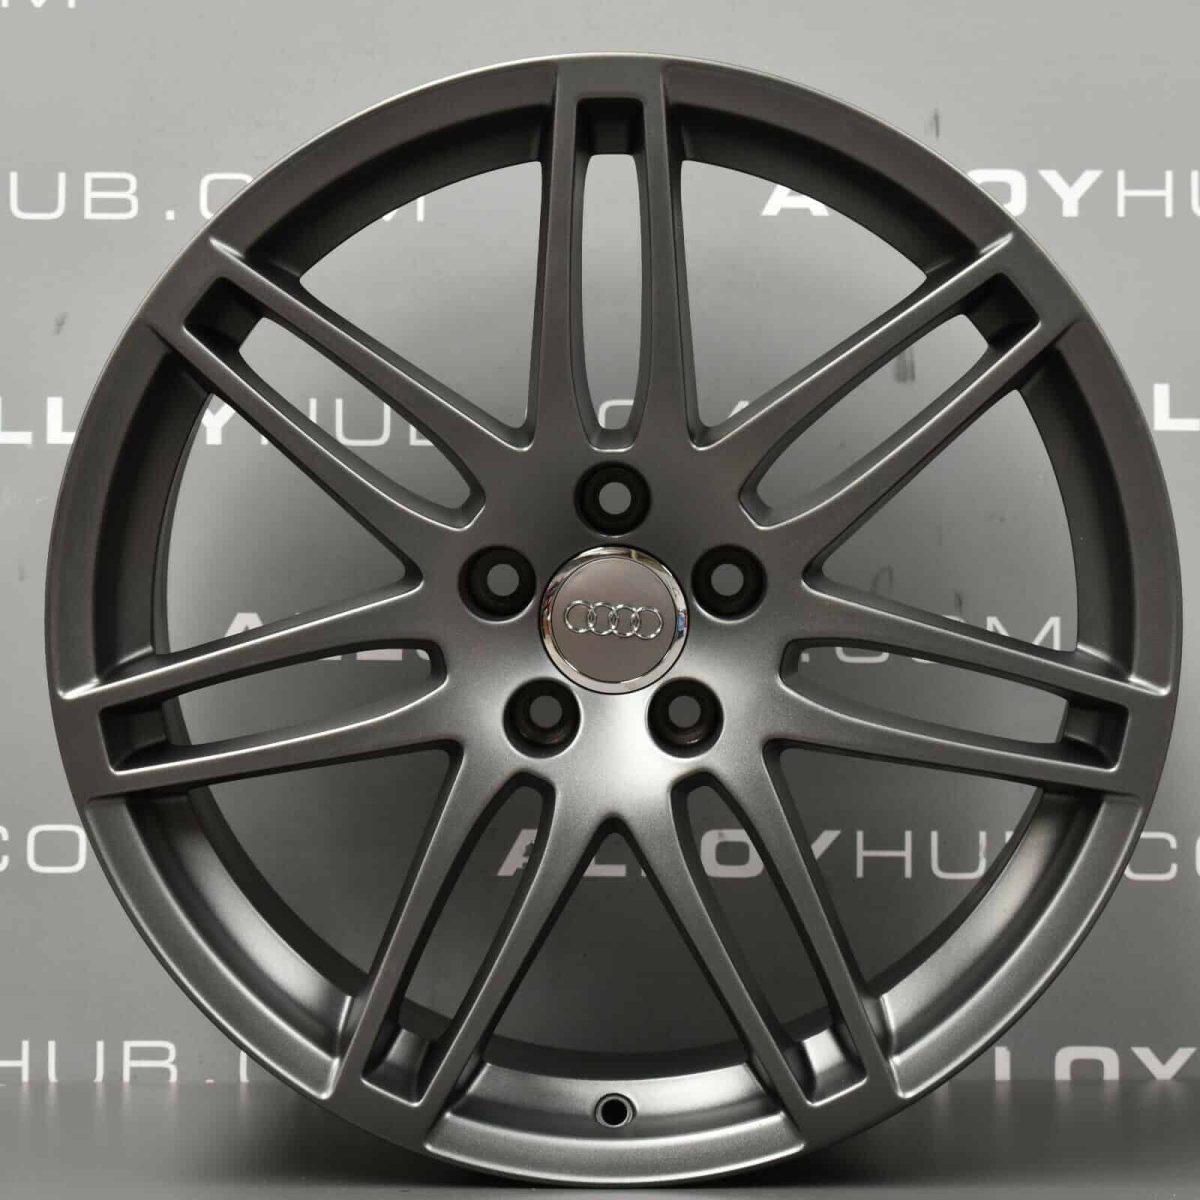 "Genuine Audi TT TTS MK2 8J 19"" Inch 7 Double Spoke S-Line Black Edition Alloy Wheels with Satin Grey Finish 8J0 601 025 N"